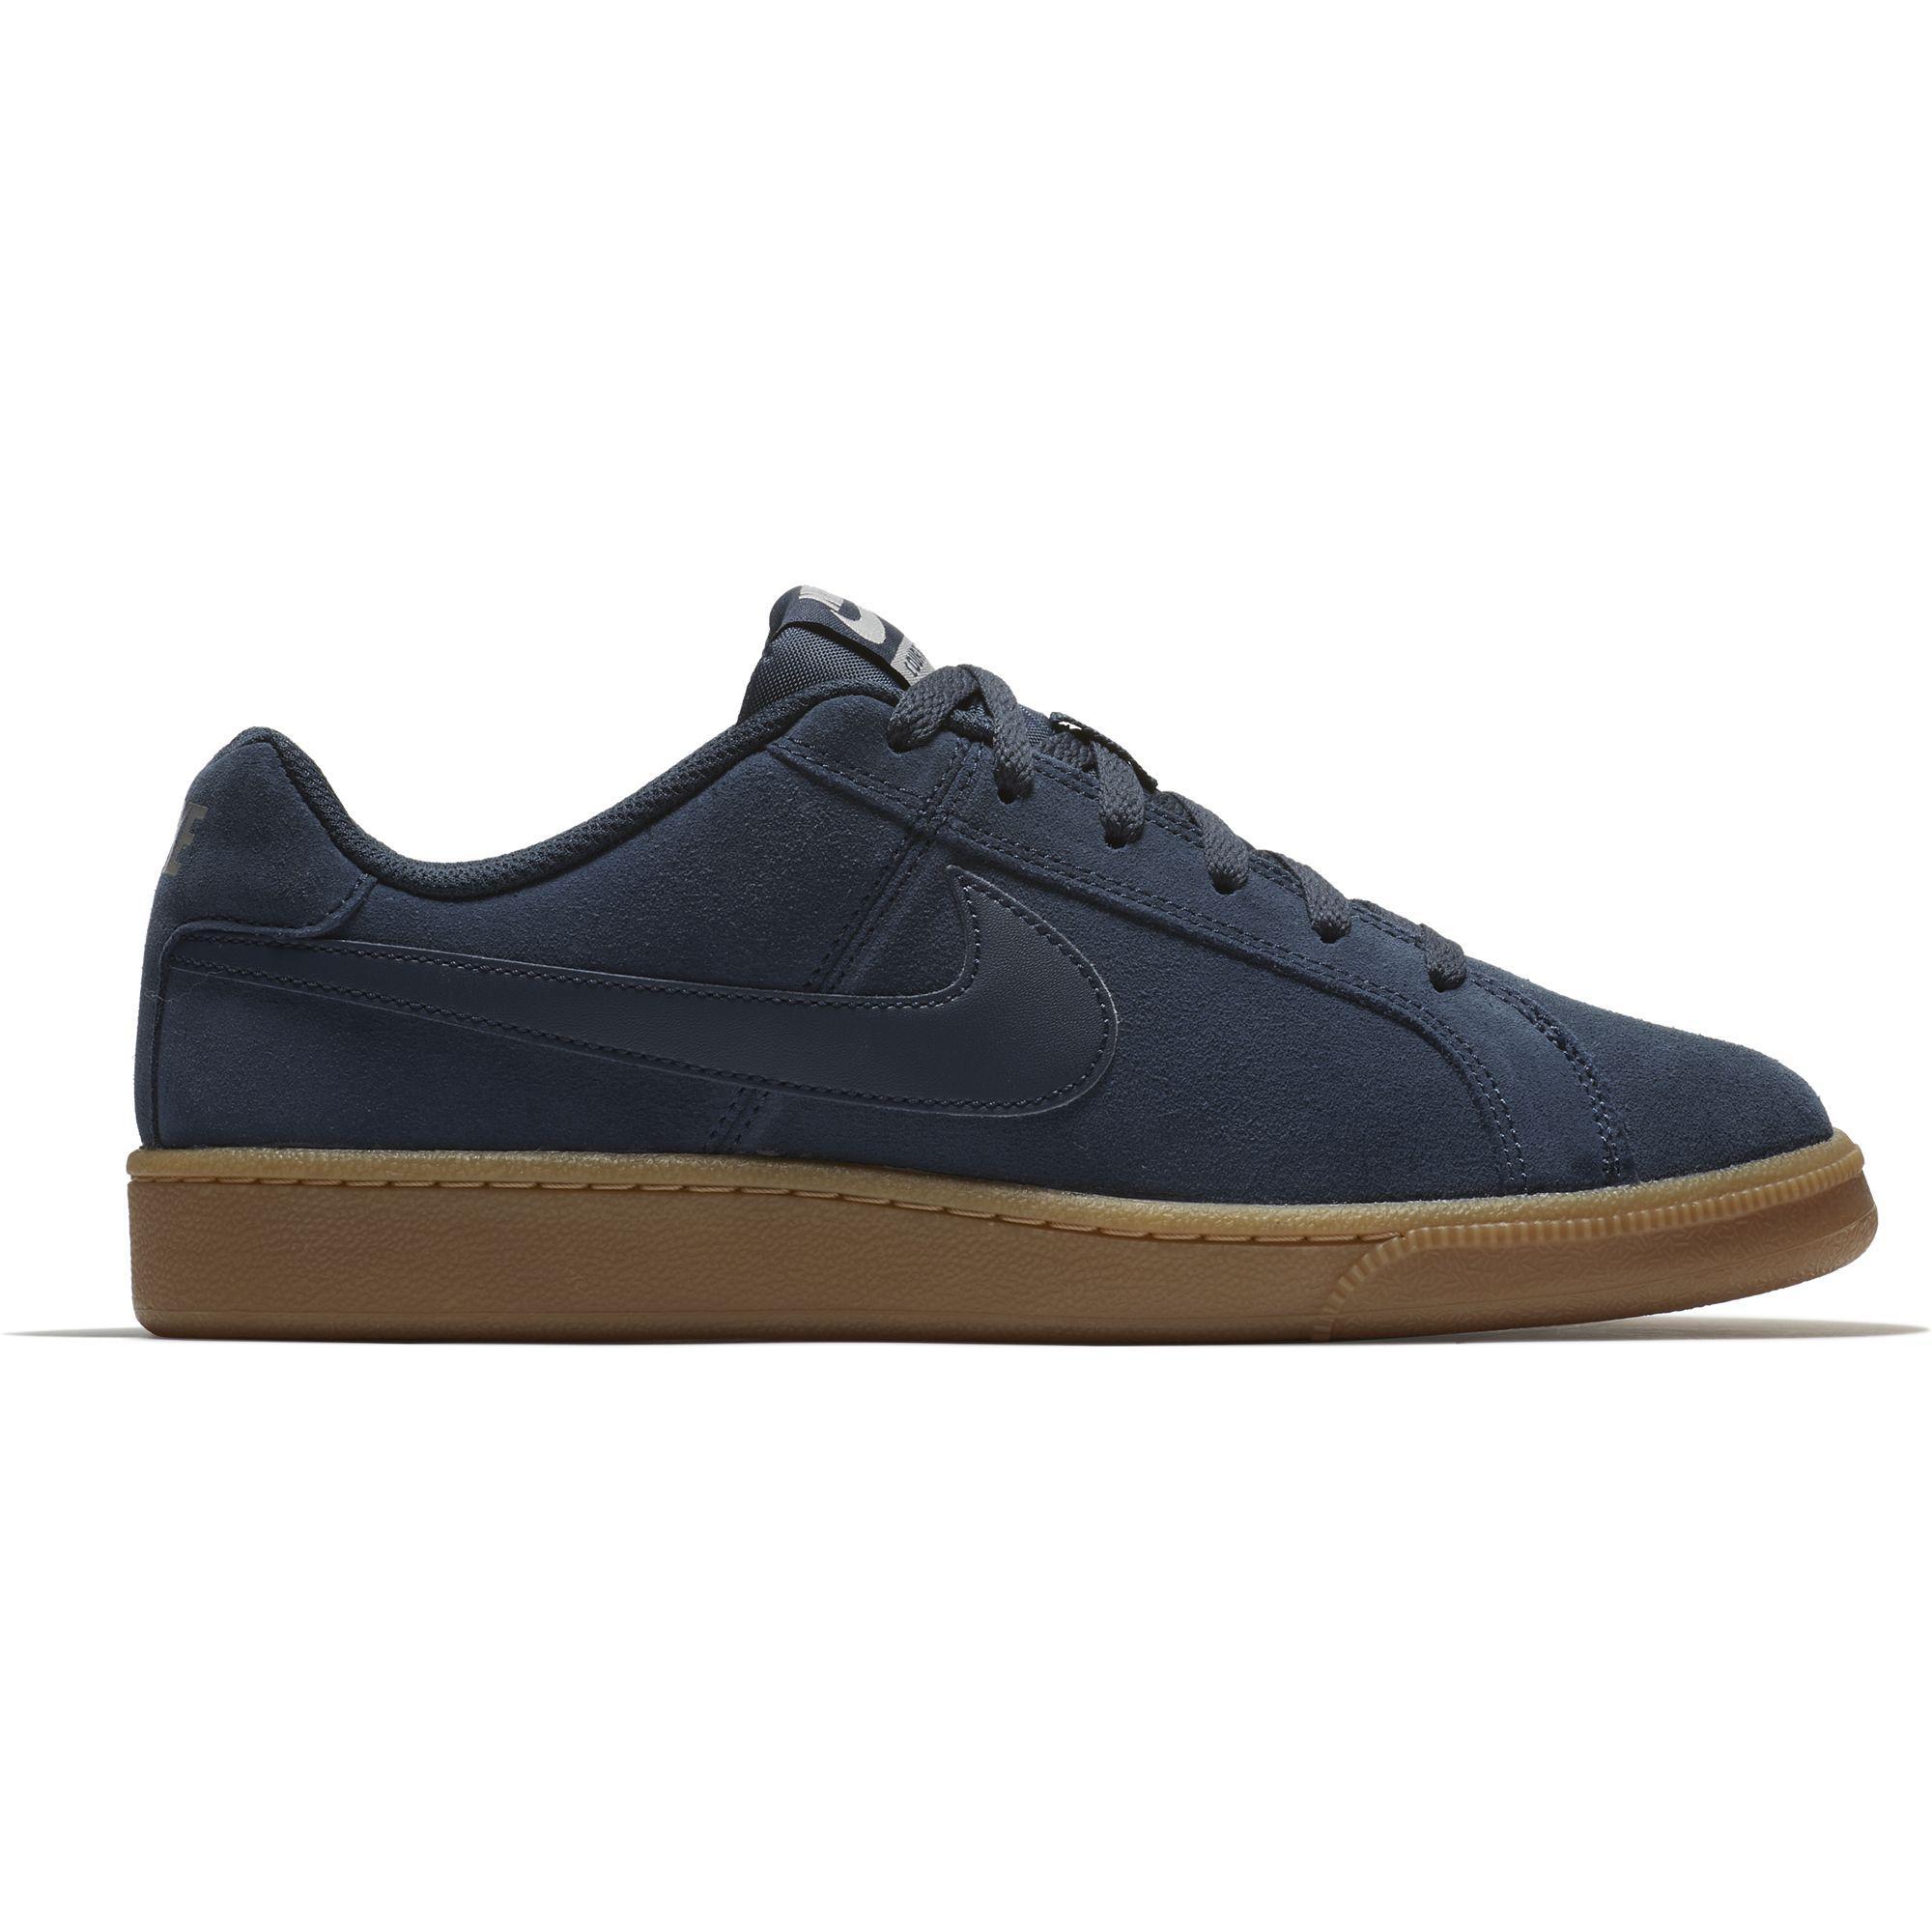 tarde láser progresivo  Nike Boys Court Royale Suede Tennis Shoes - Navy - Tennisnuts.com